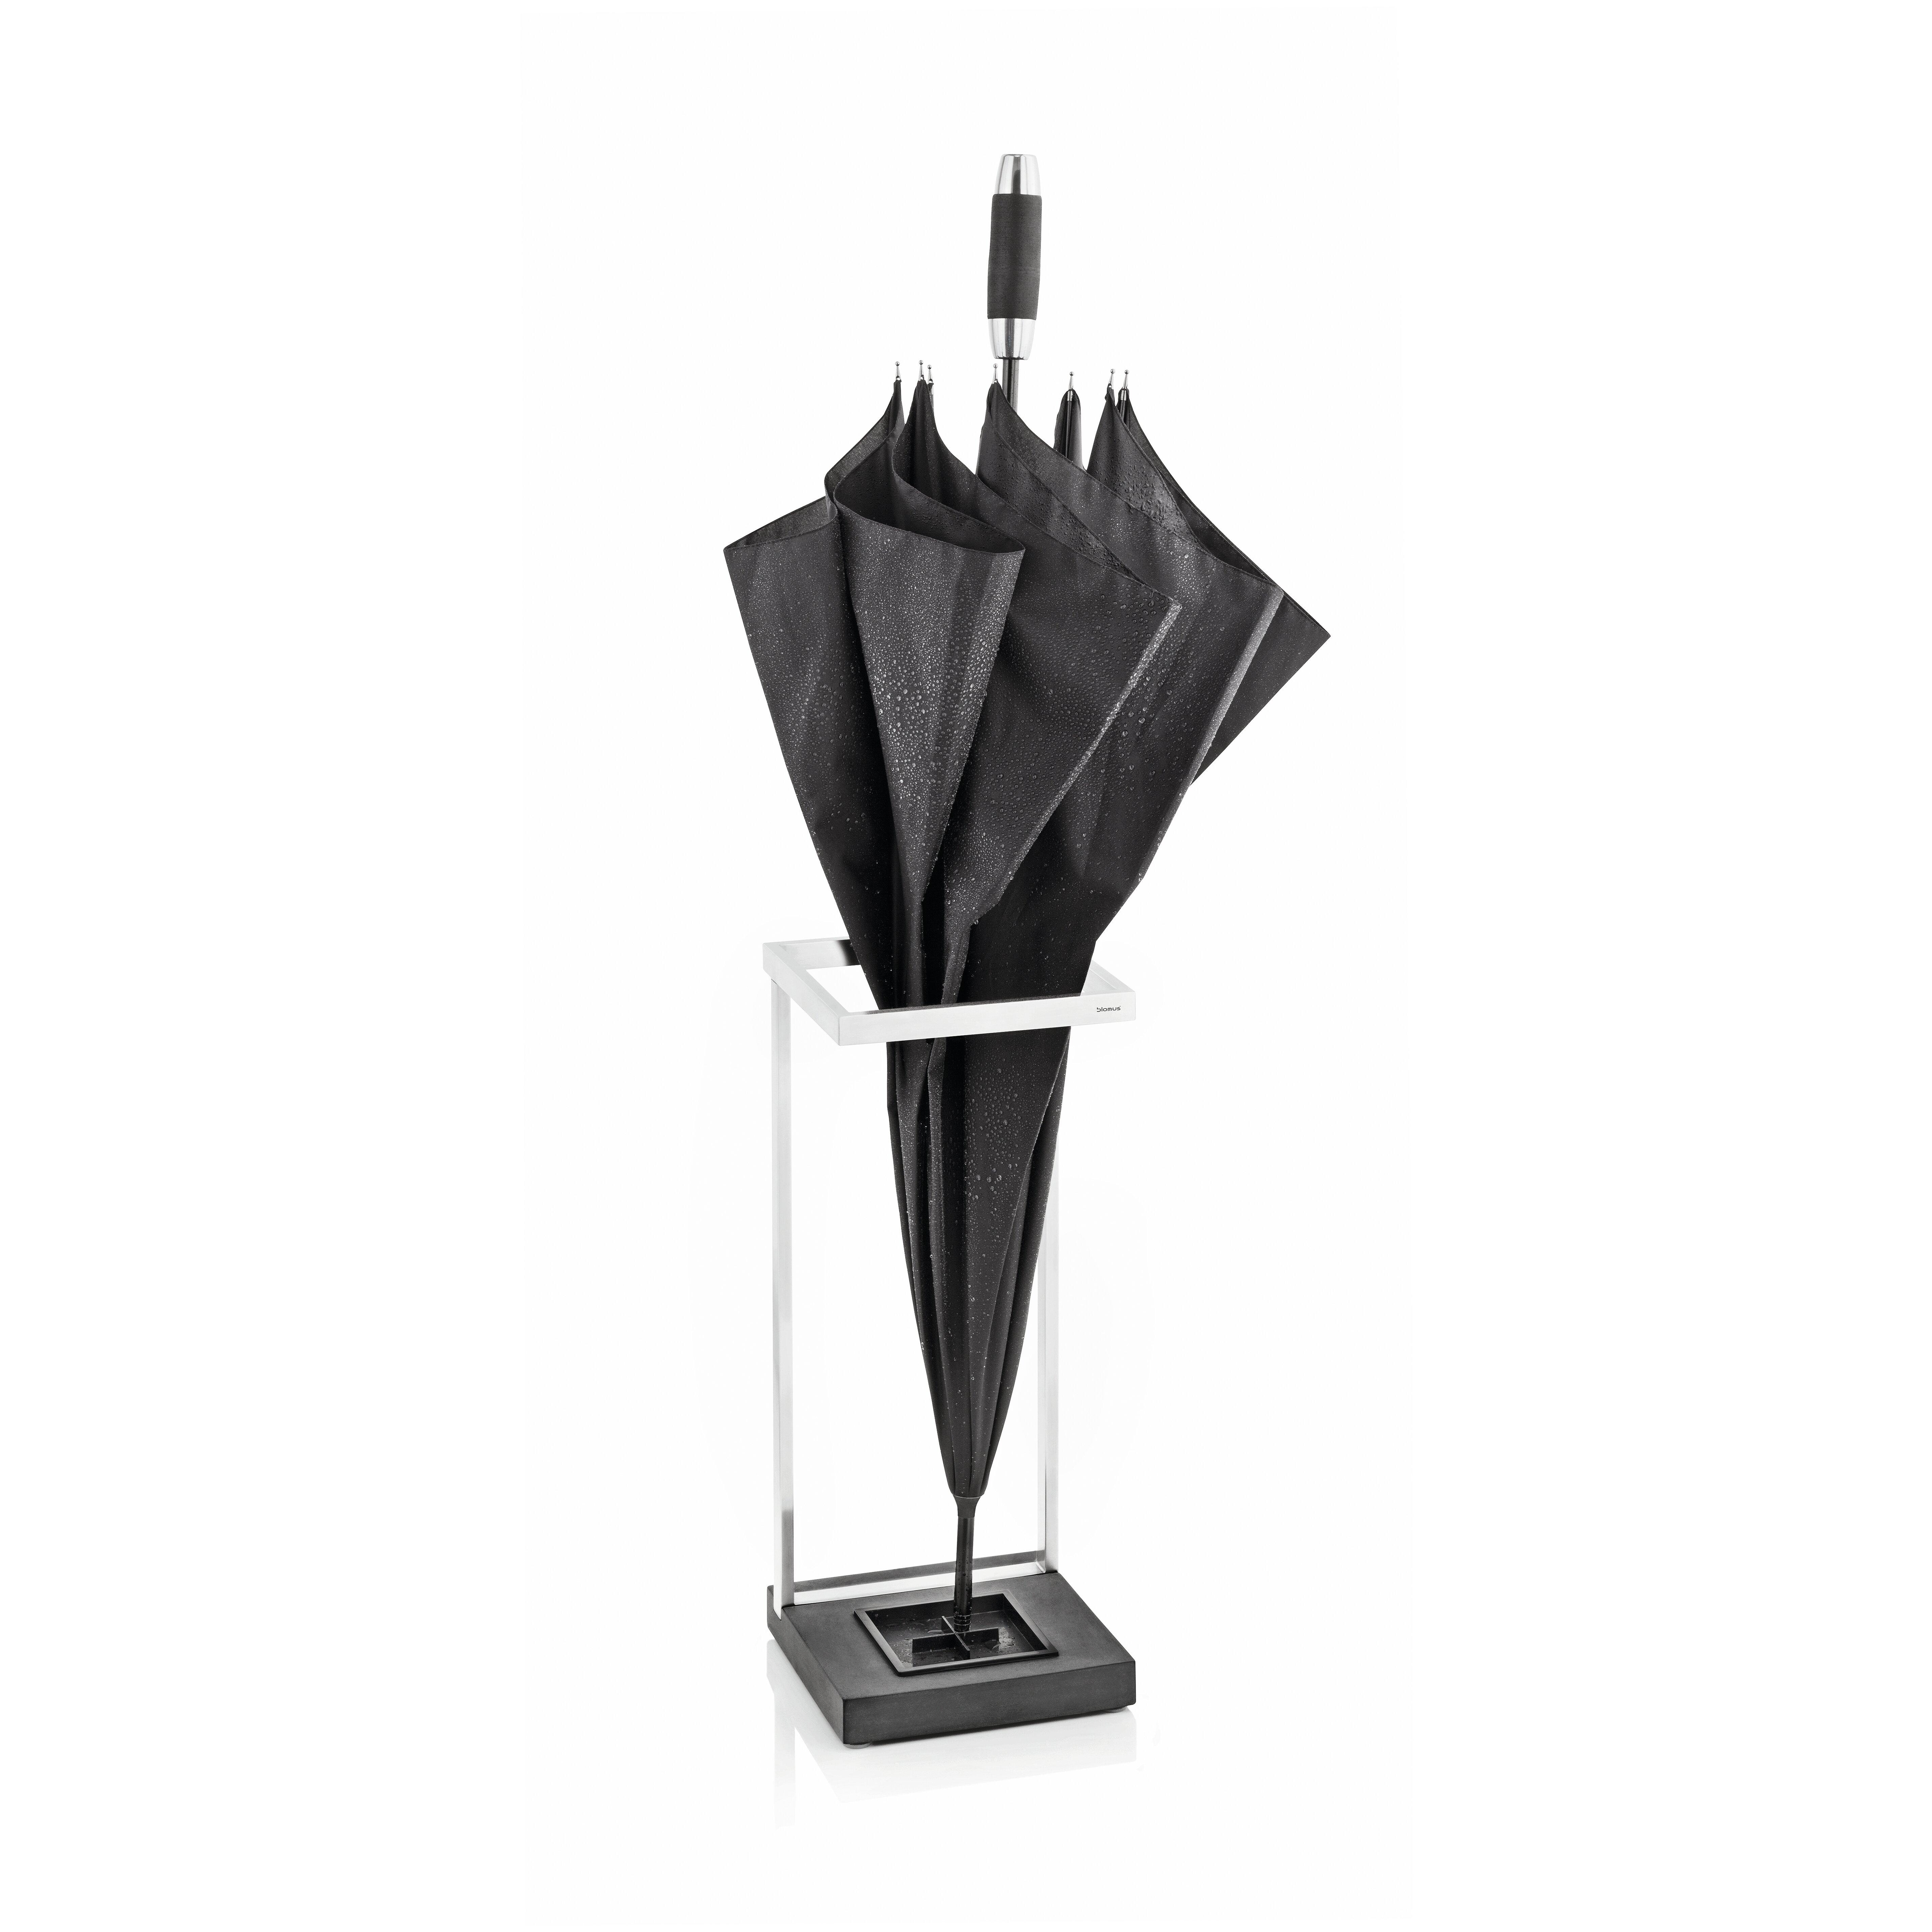 Umbrella Stand Next: Blomus Menotto Umbrella Stand & Reviews